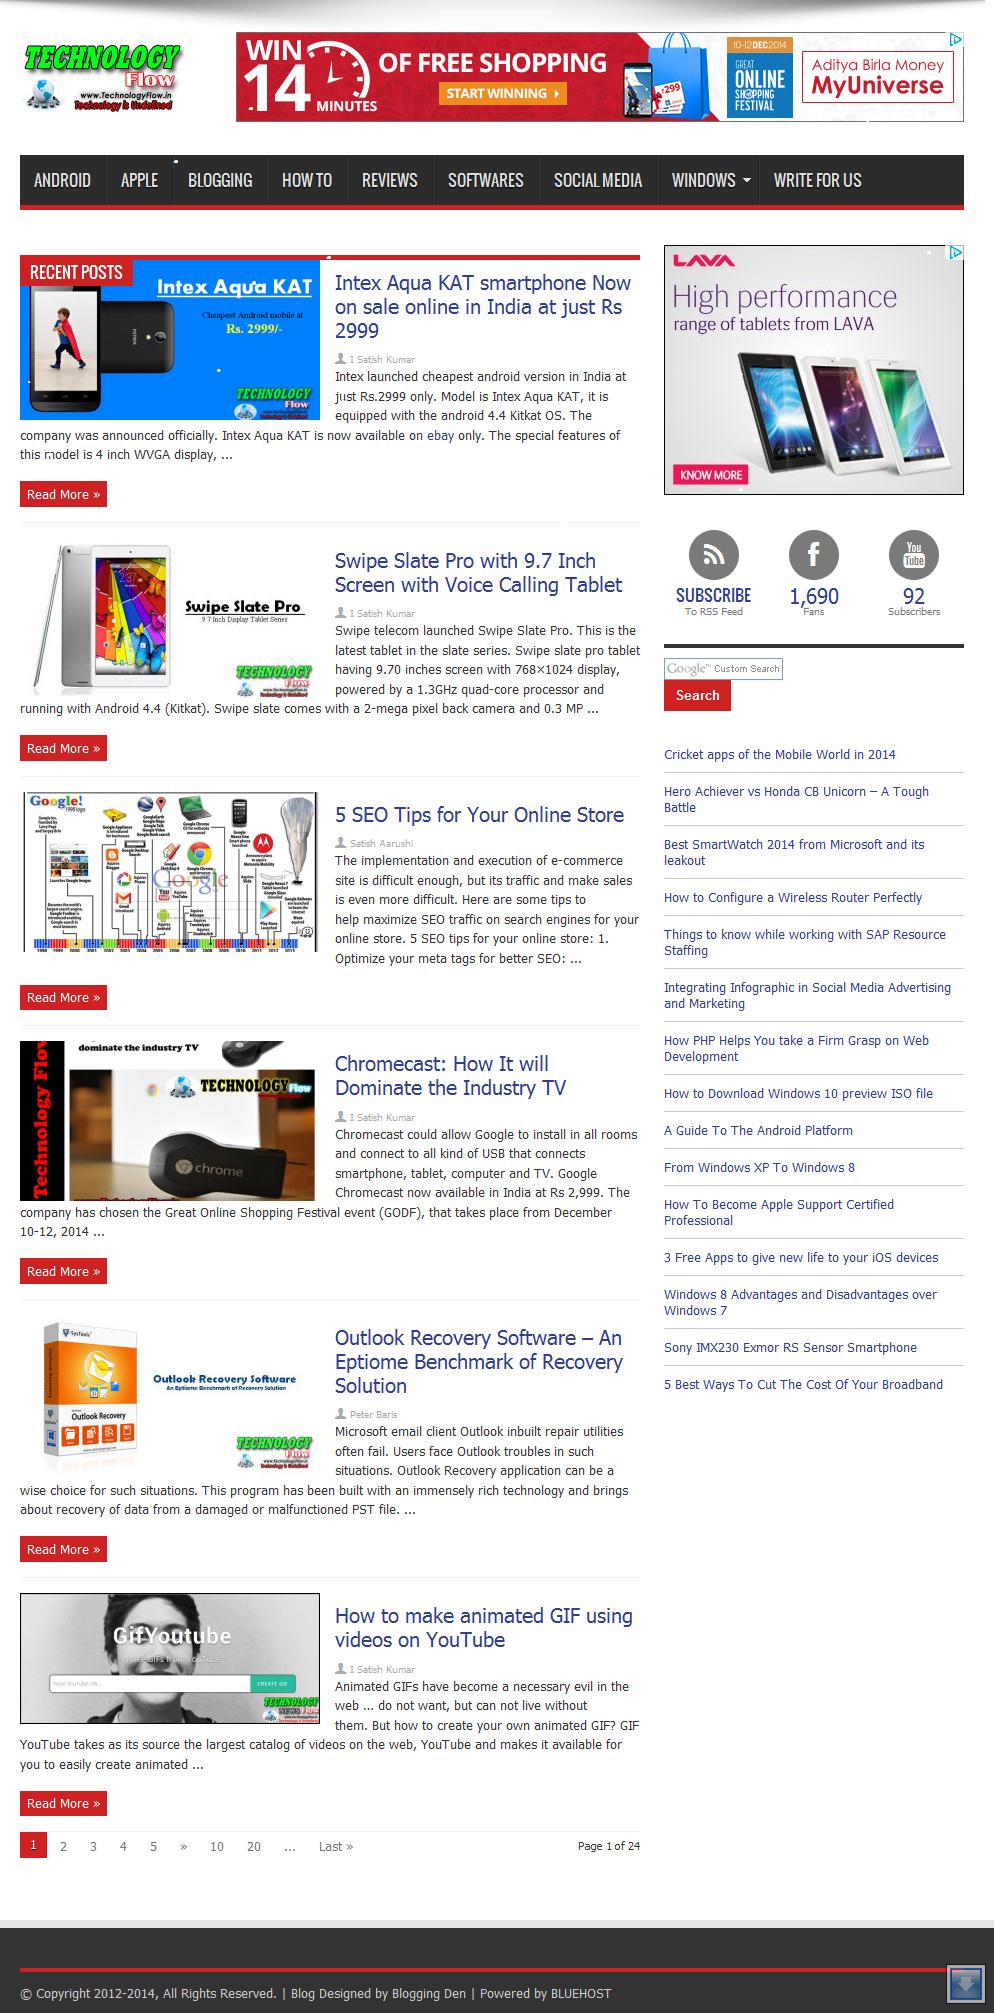 TechnologyFlow Sponsored Blog Review for